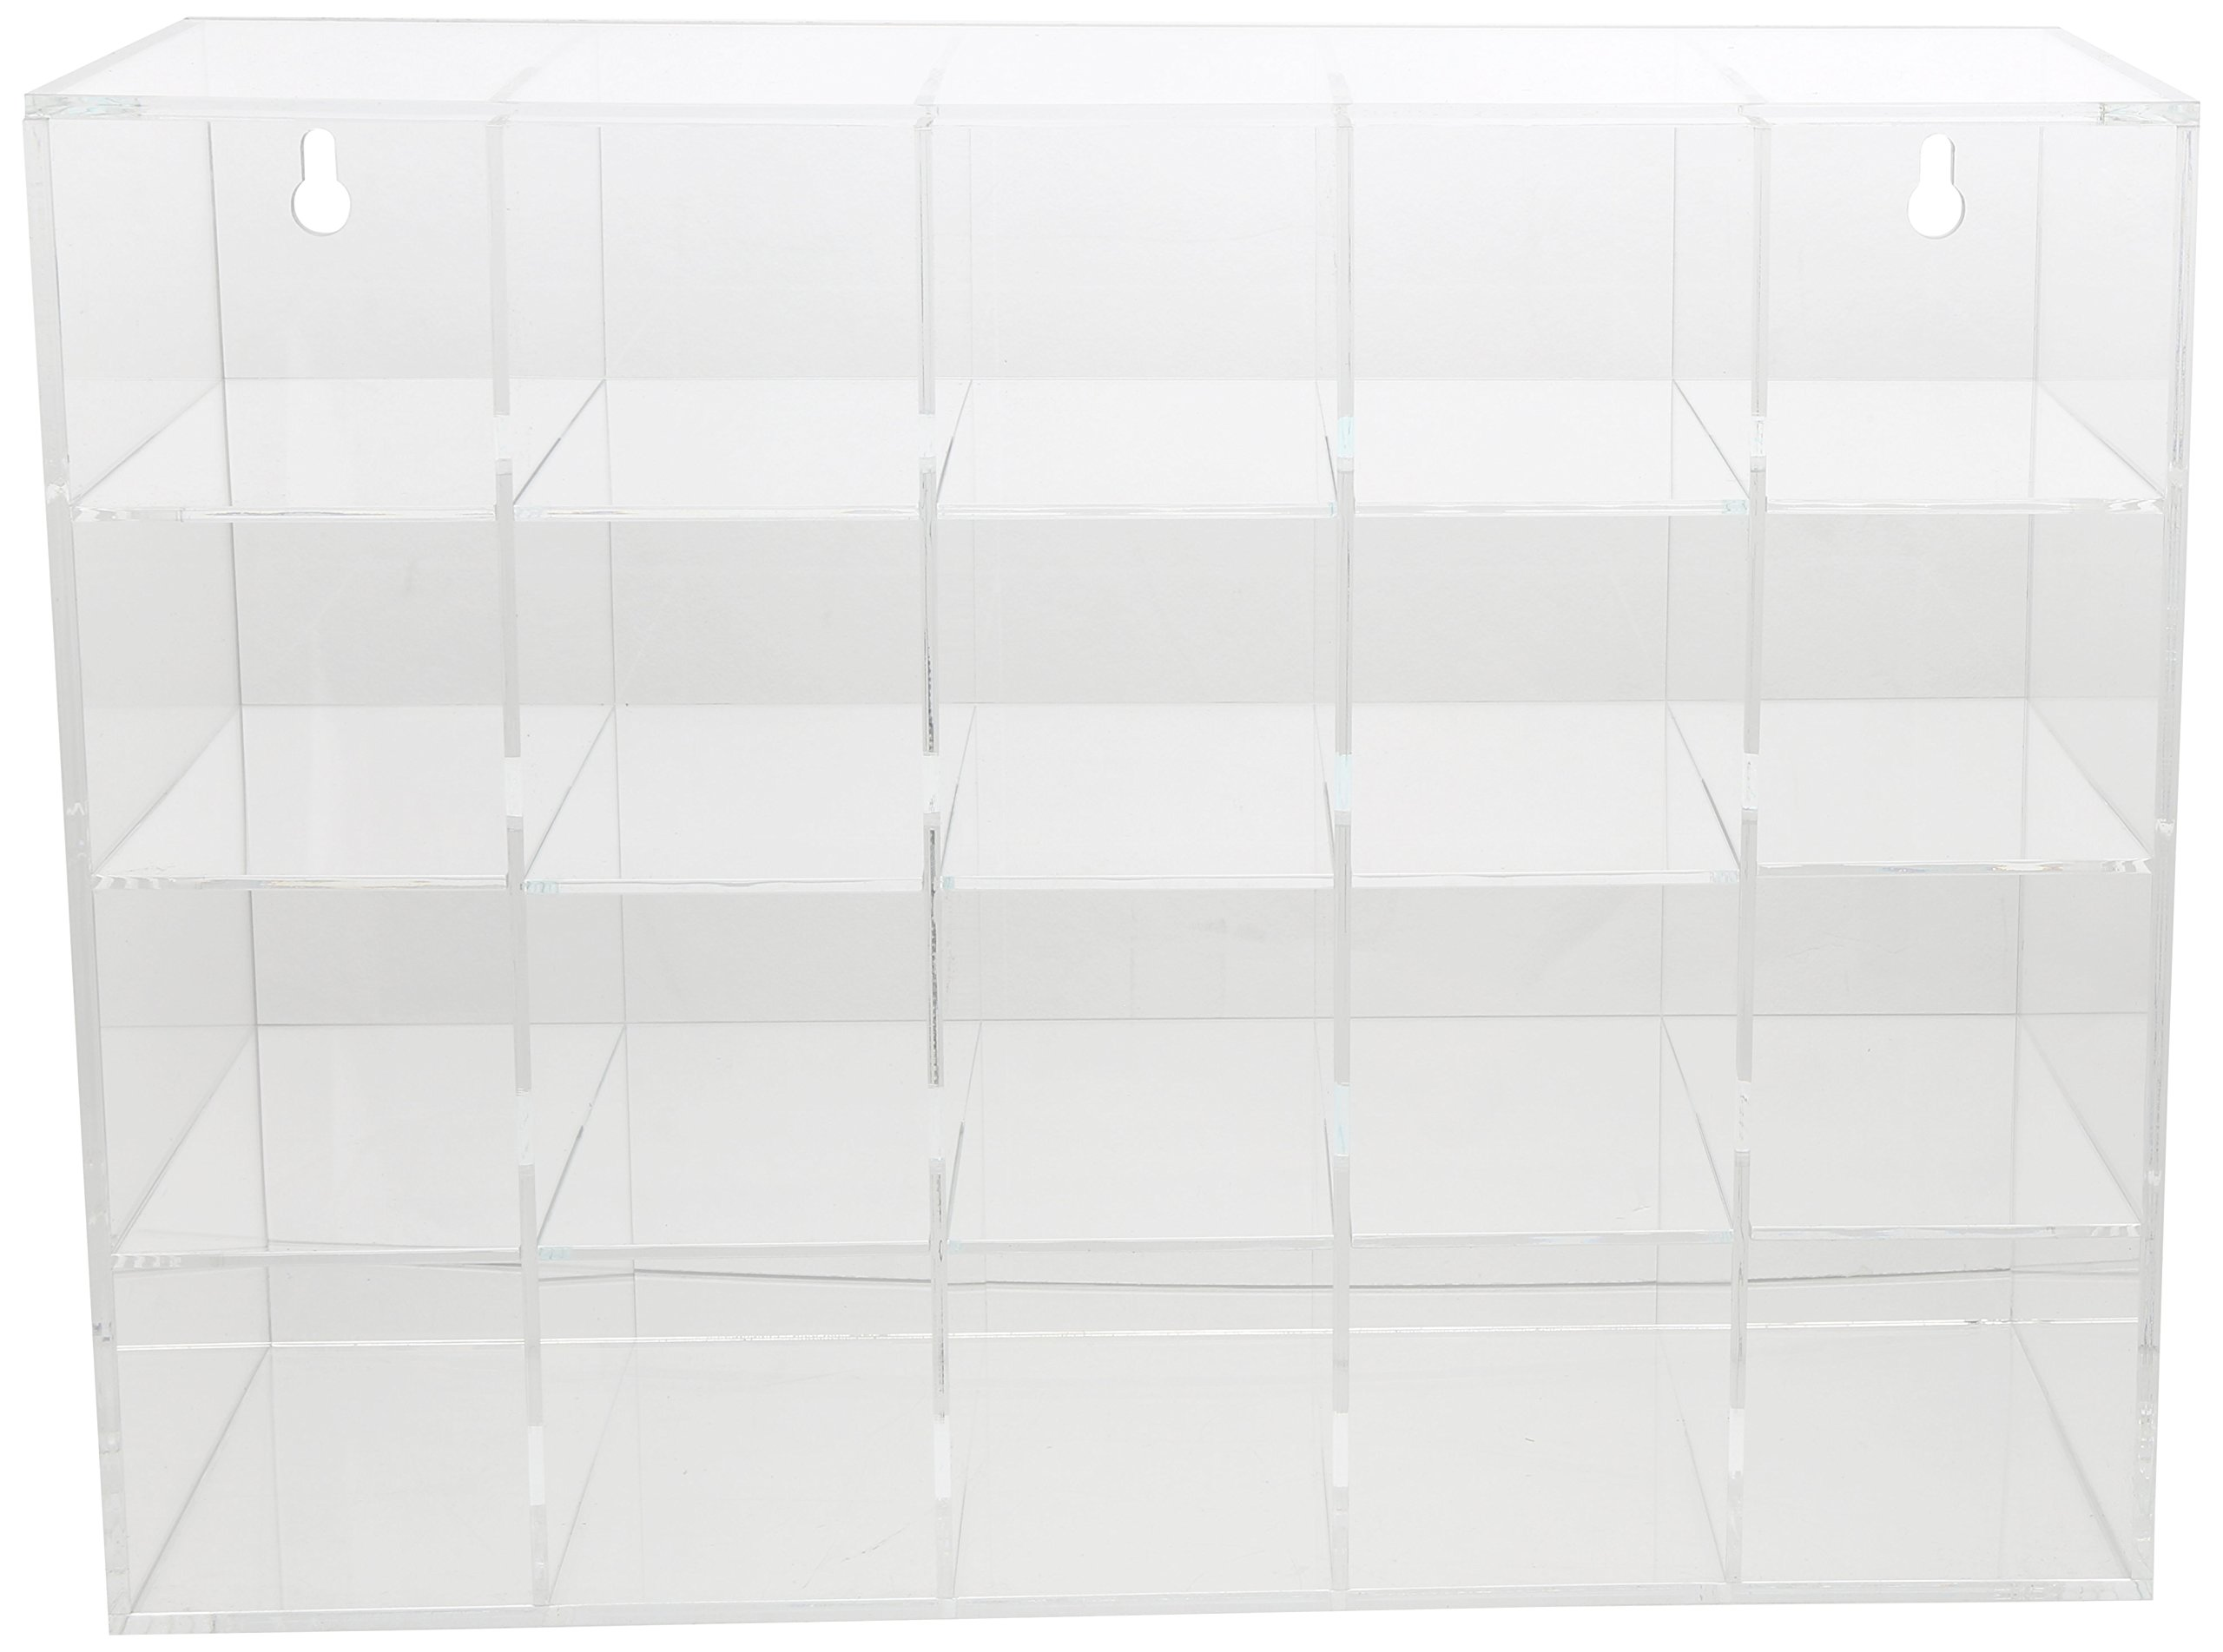 Brady 45439 Prinzing Safety Glass Holder